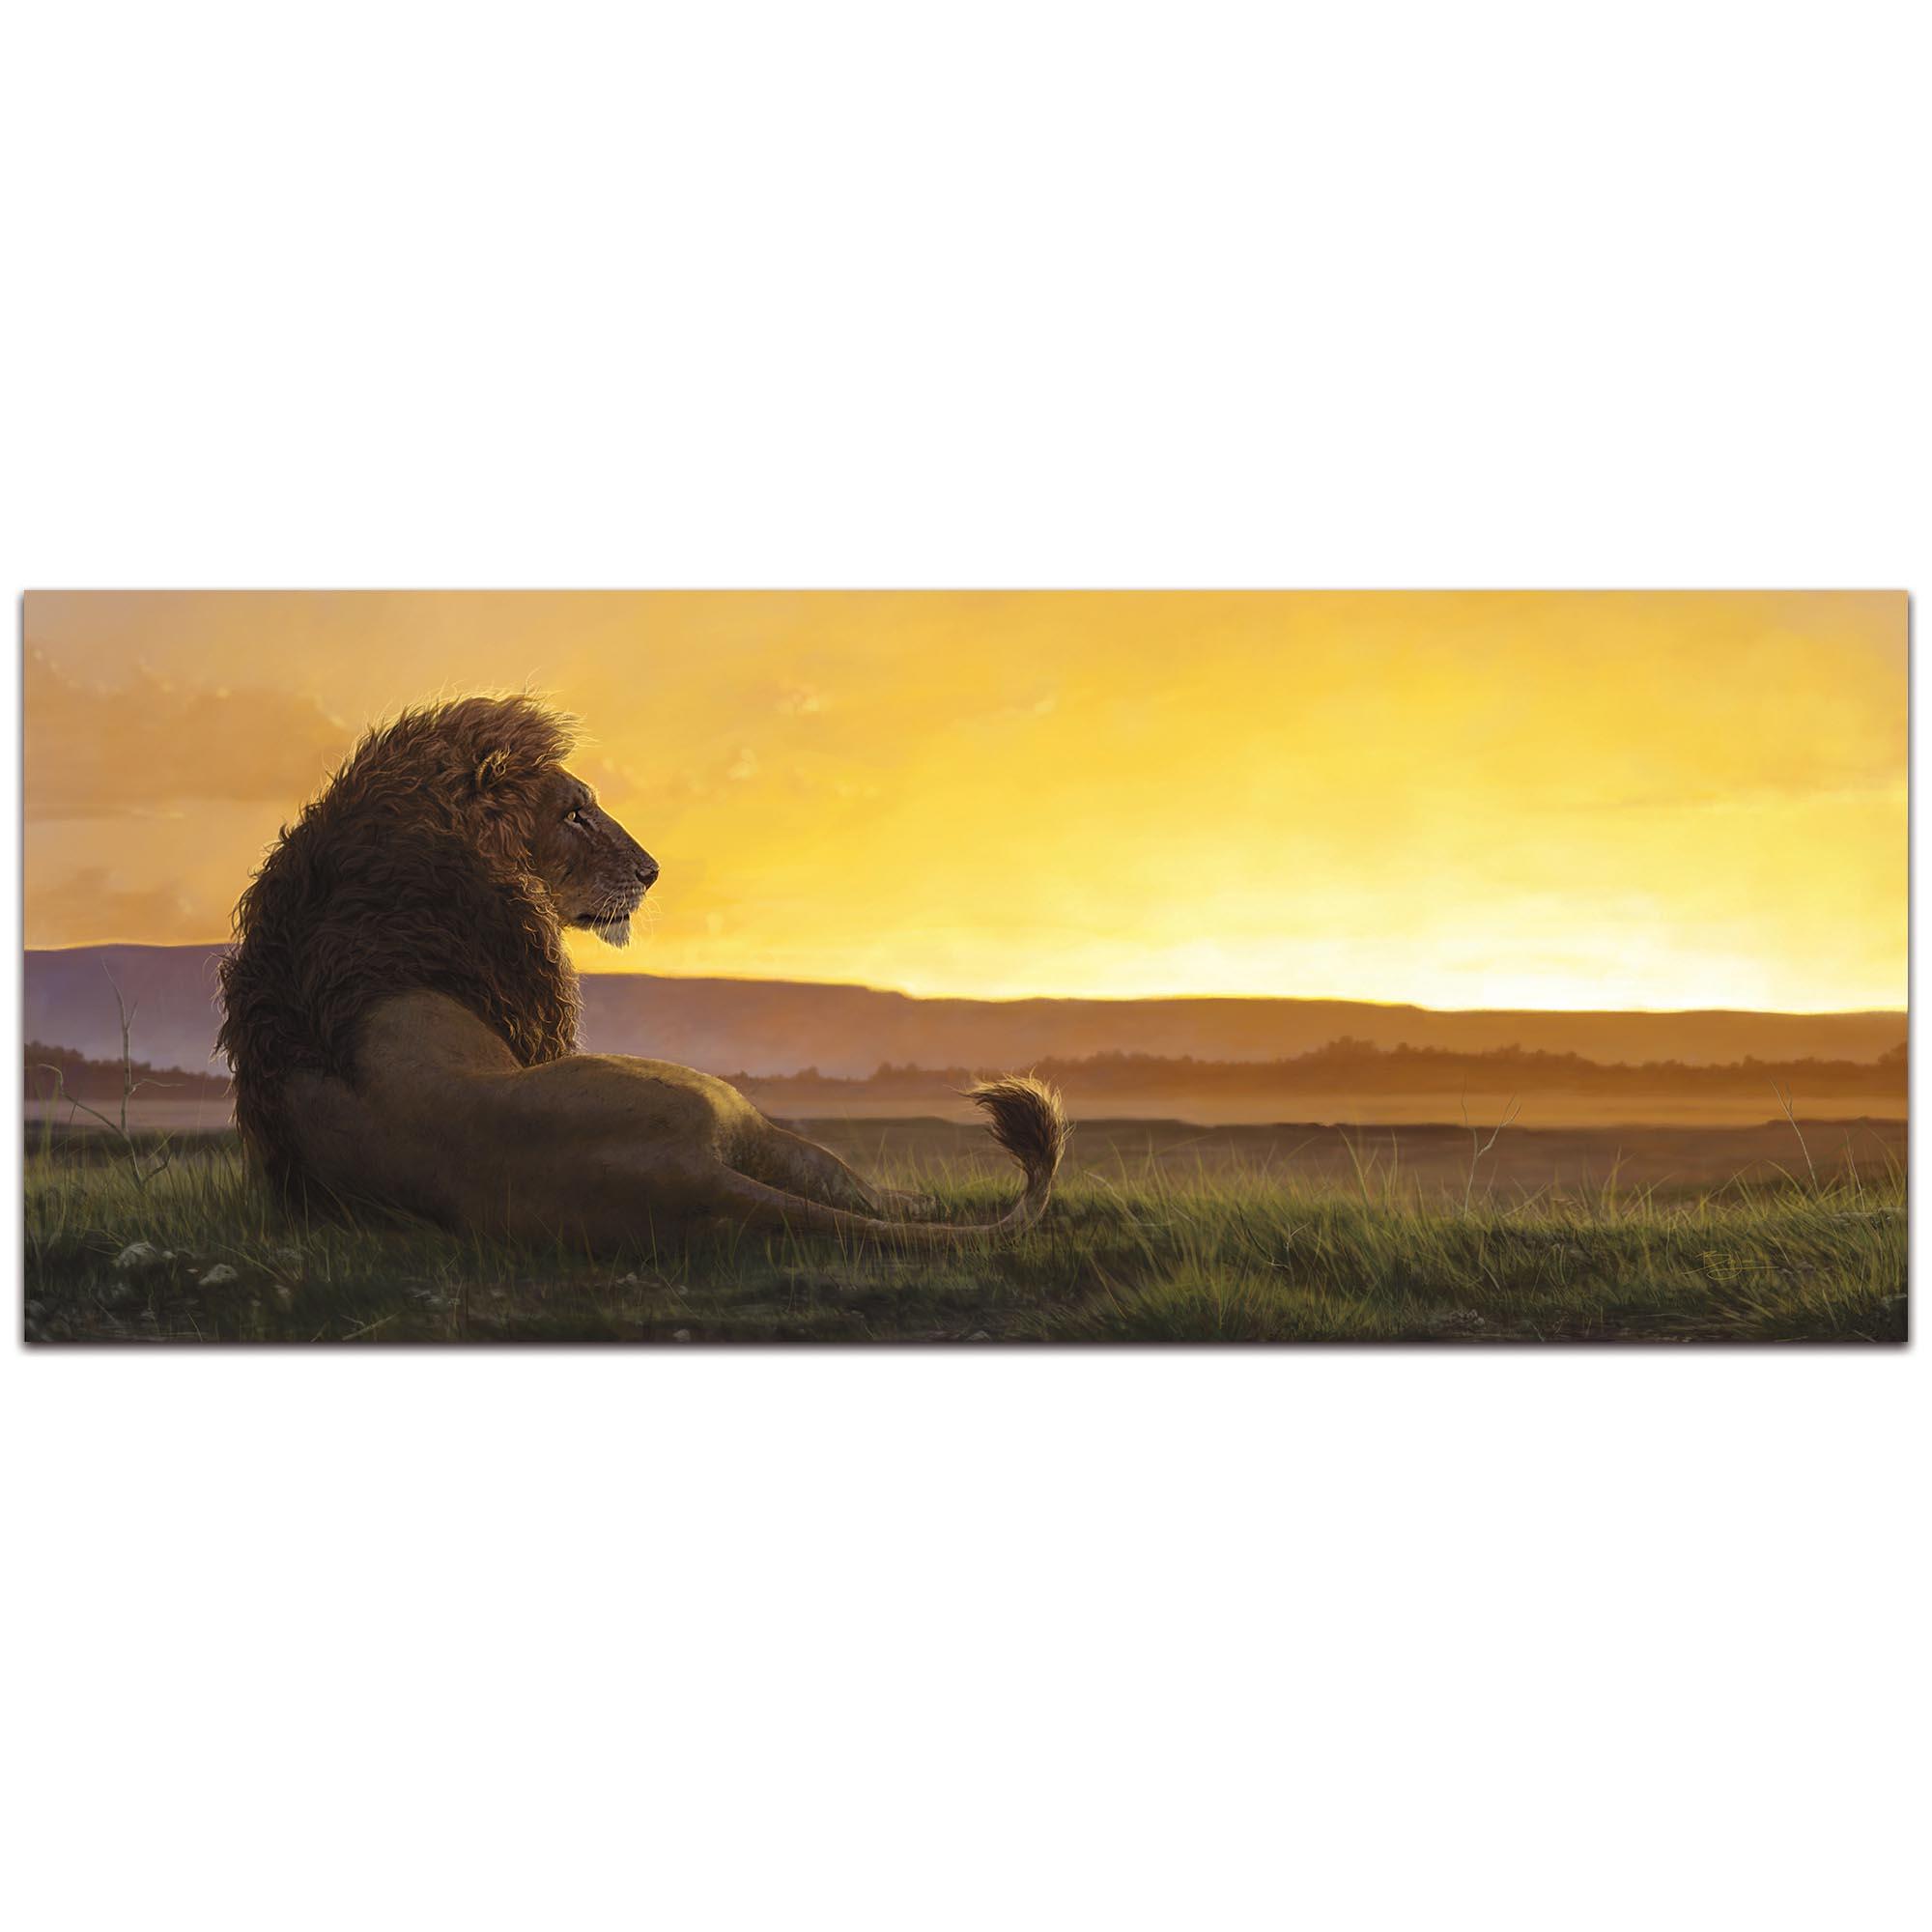 Expressionist Wall Art 'Lion in the Sun' - Wildlife Decor on Metal or Plexiglass